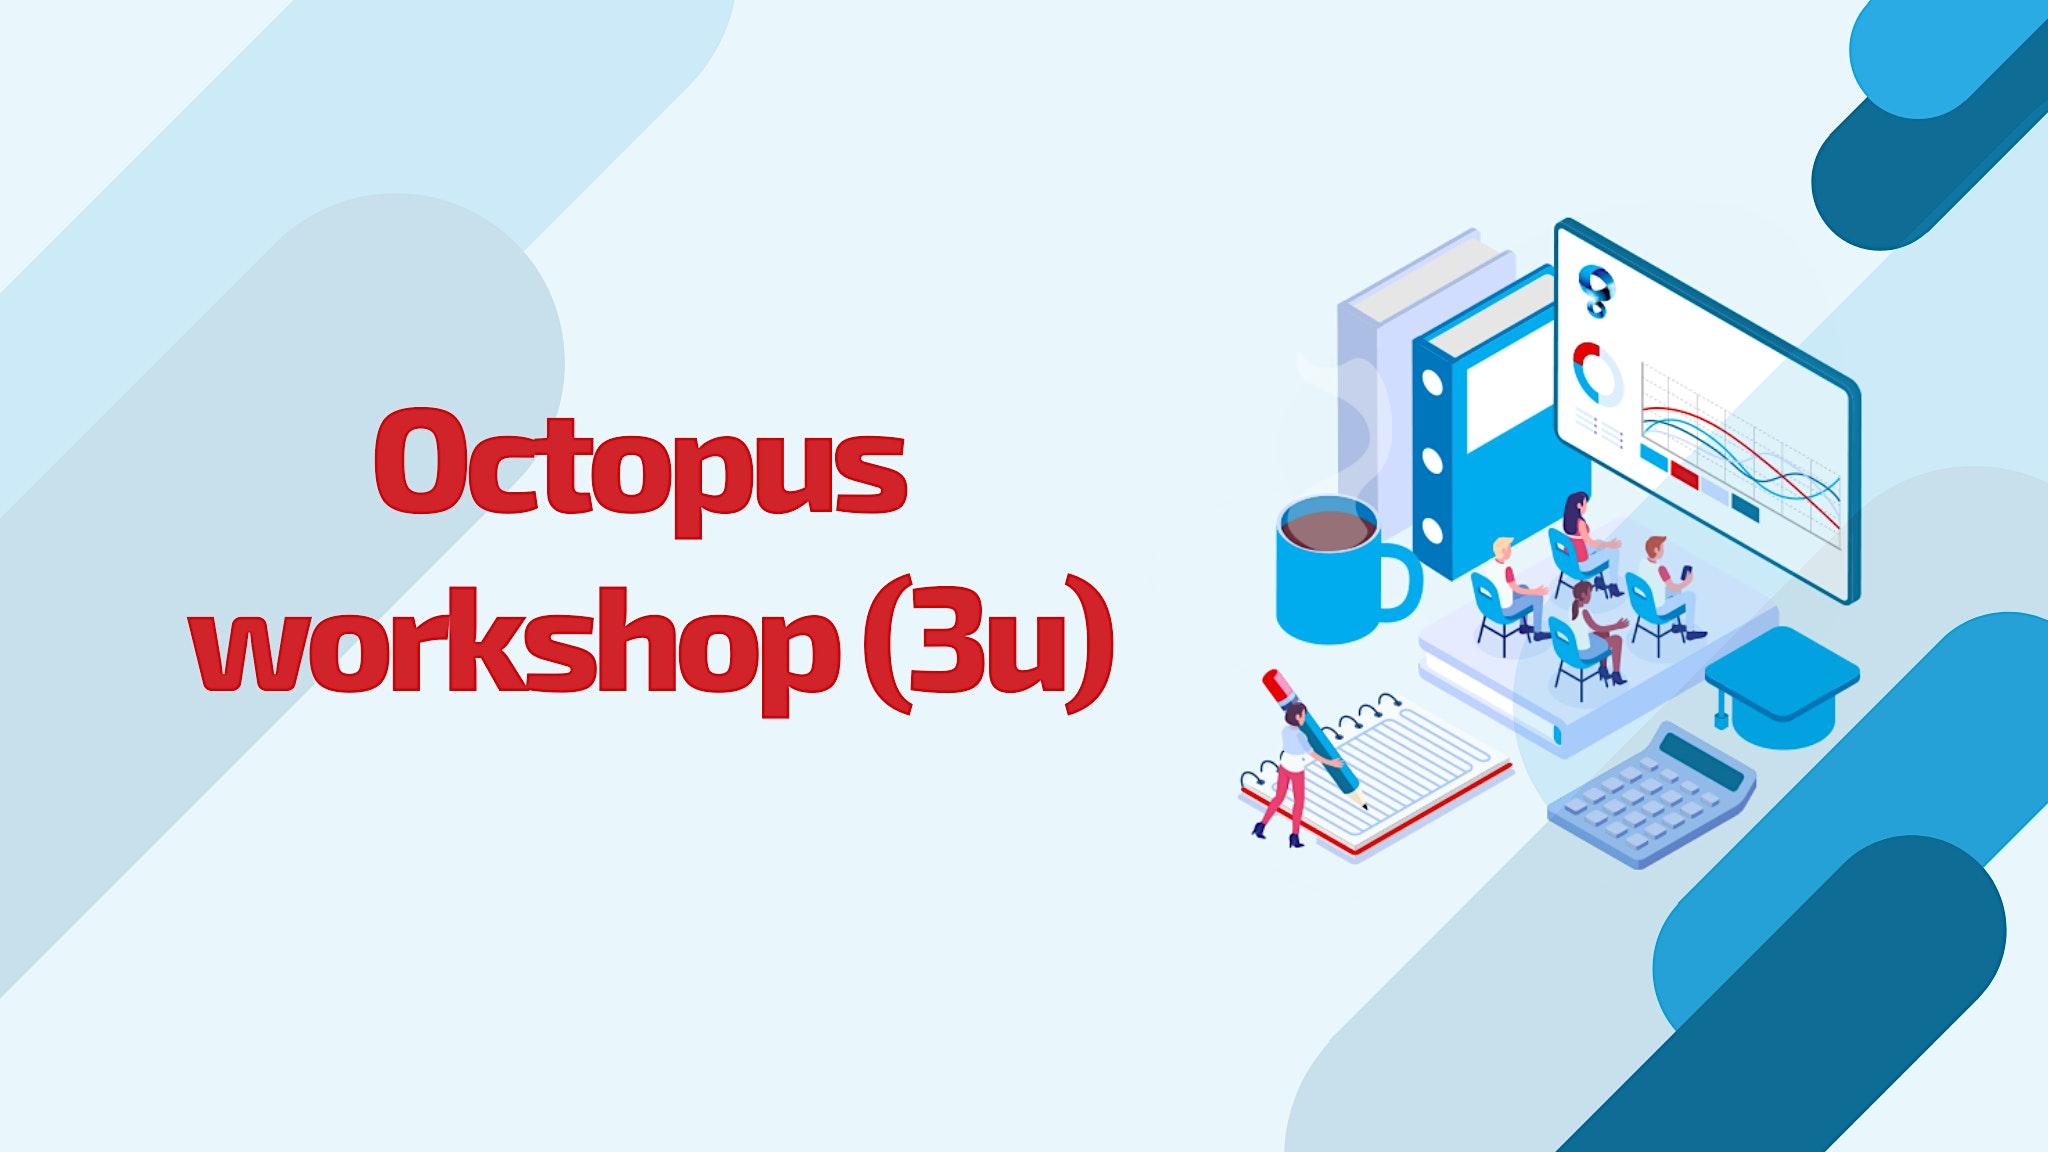 Octopus opleiding: Turnhout